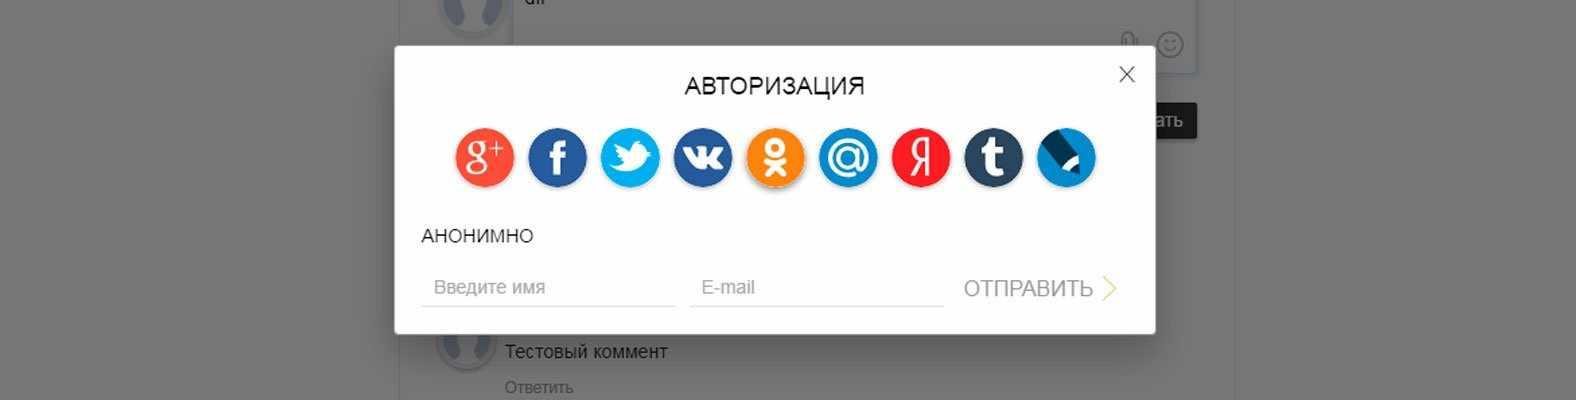 HyperComments - соц-сети для авторизации